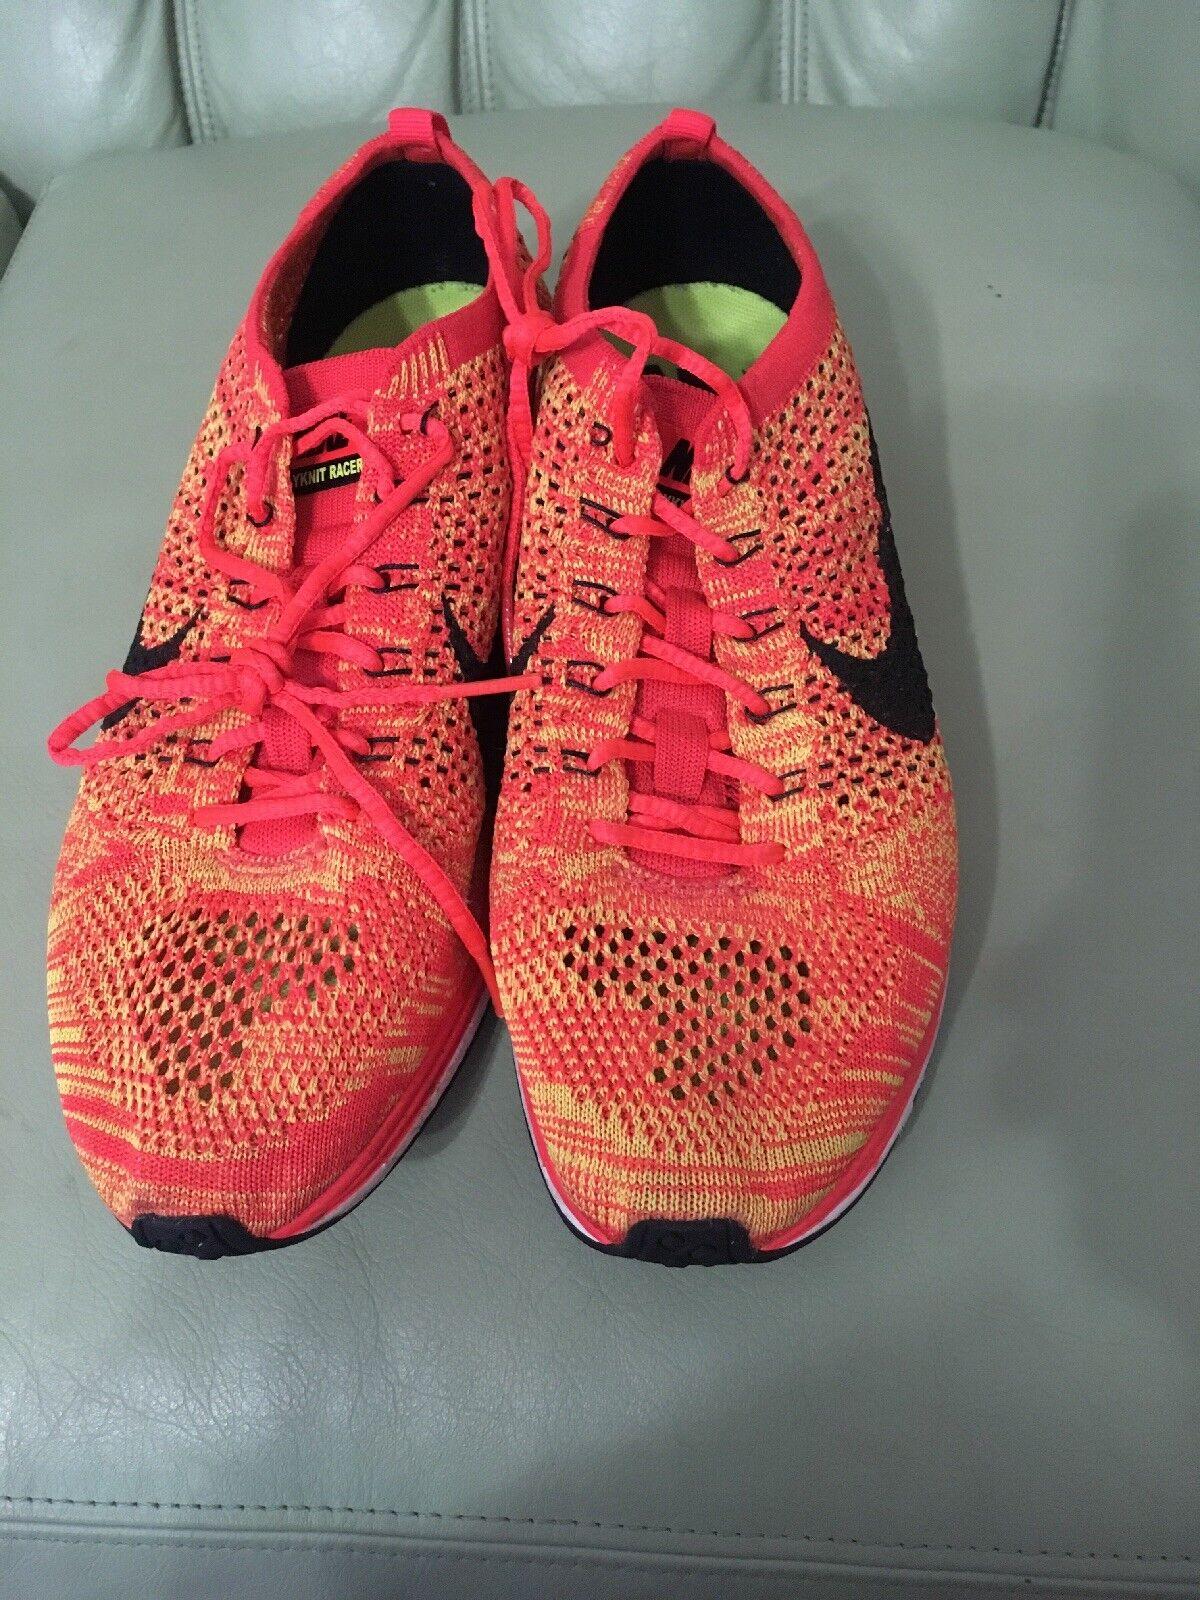 Nike Nike Nike flyknit racer misura 7,5 uomini o donne numero 9 | Nuovo 2019  | Uomo/Donna Scarpa  ac1e11